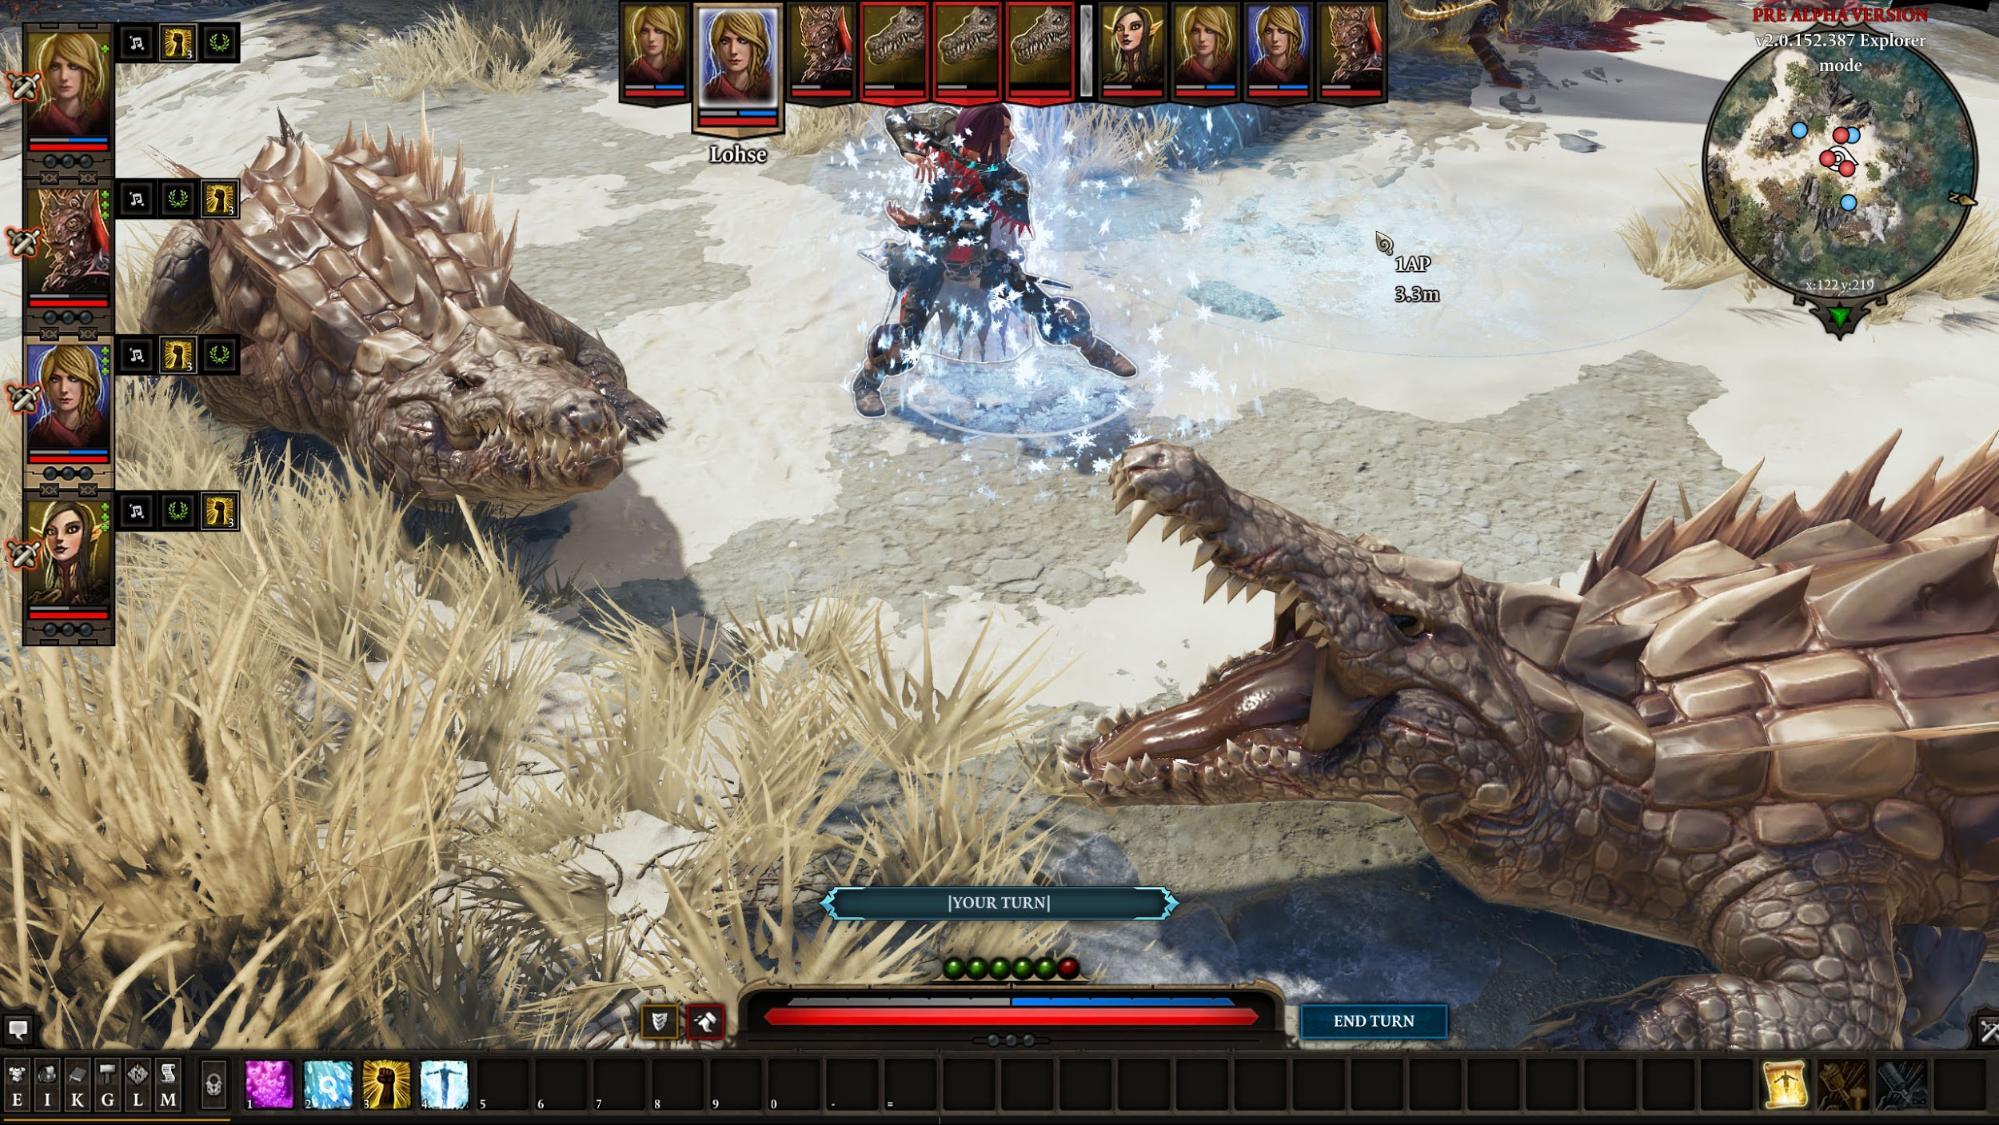 Top 15 Games Like Pillars of Eternity | GAMERS DECIDE